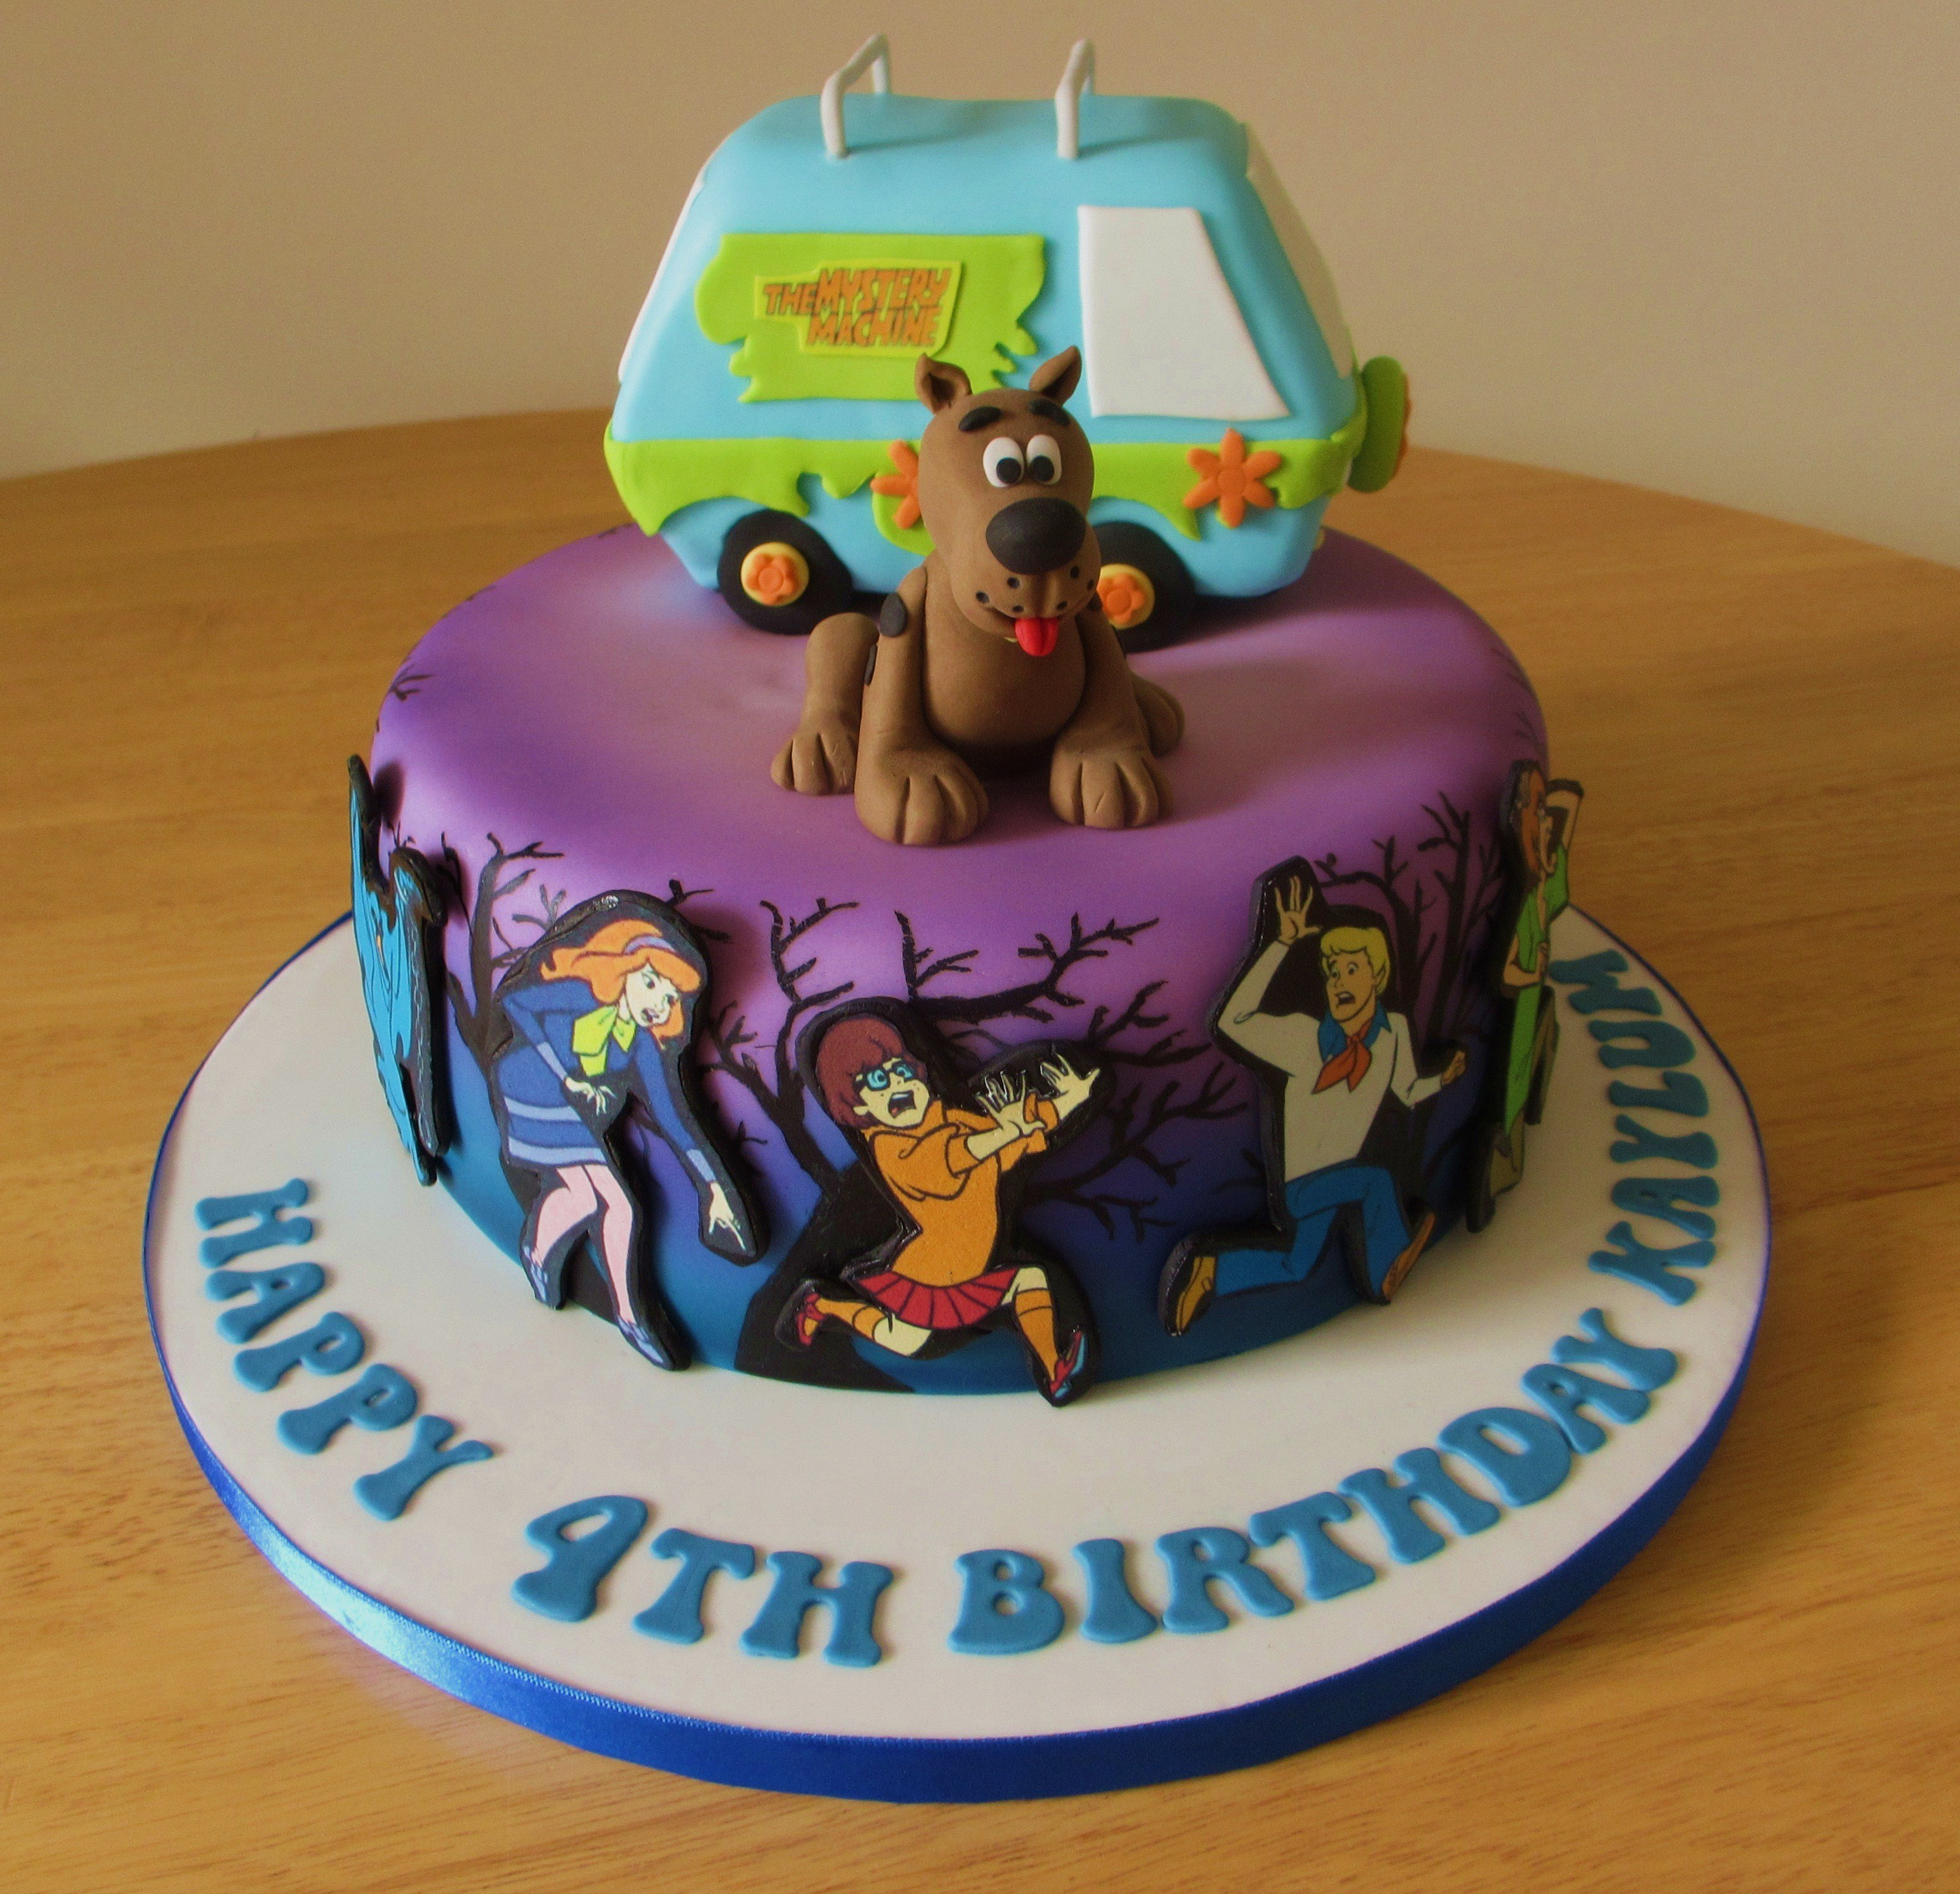 10 Easy Scooby Doo Cakes Photo Scooby Doo Birthday Cake